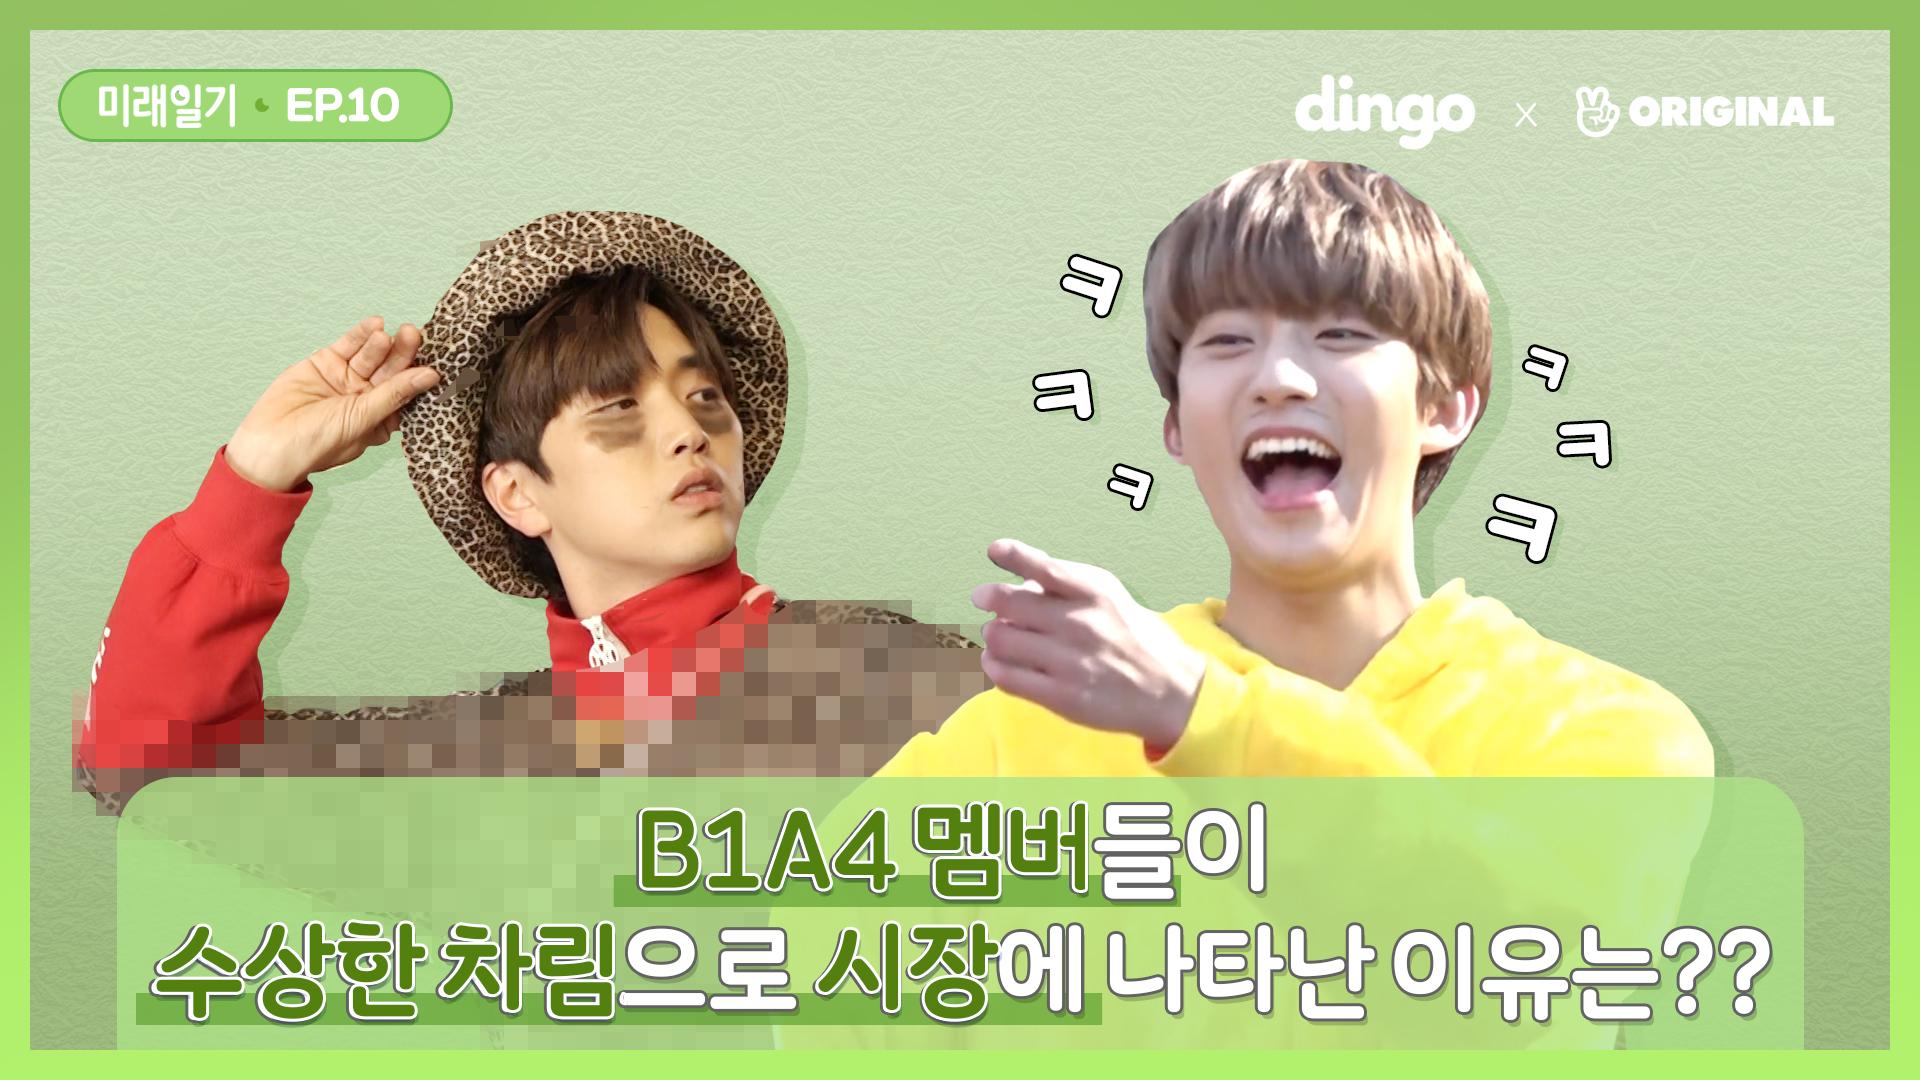 B1A4가 수상한 모습으로 거리를 활보한 사연은?? [미래일기_ep 10]